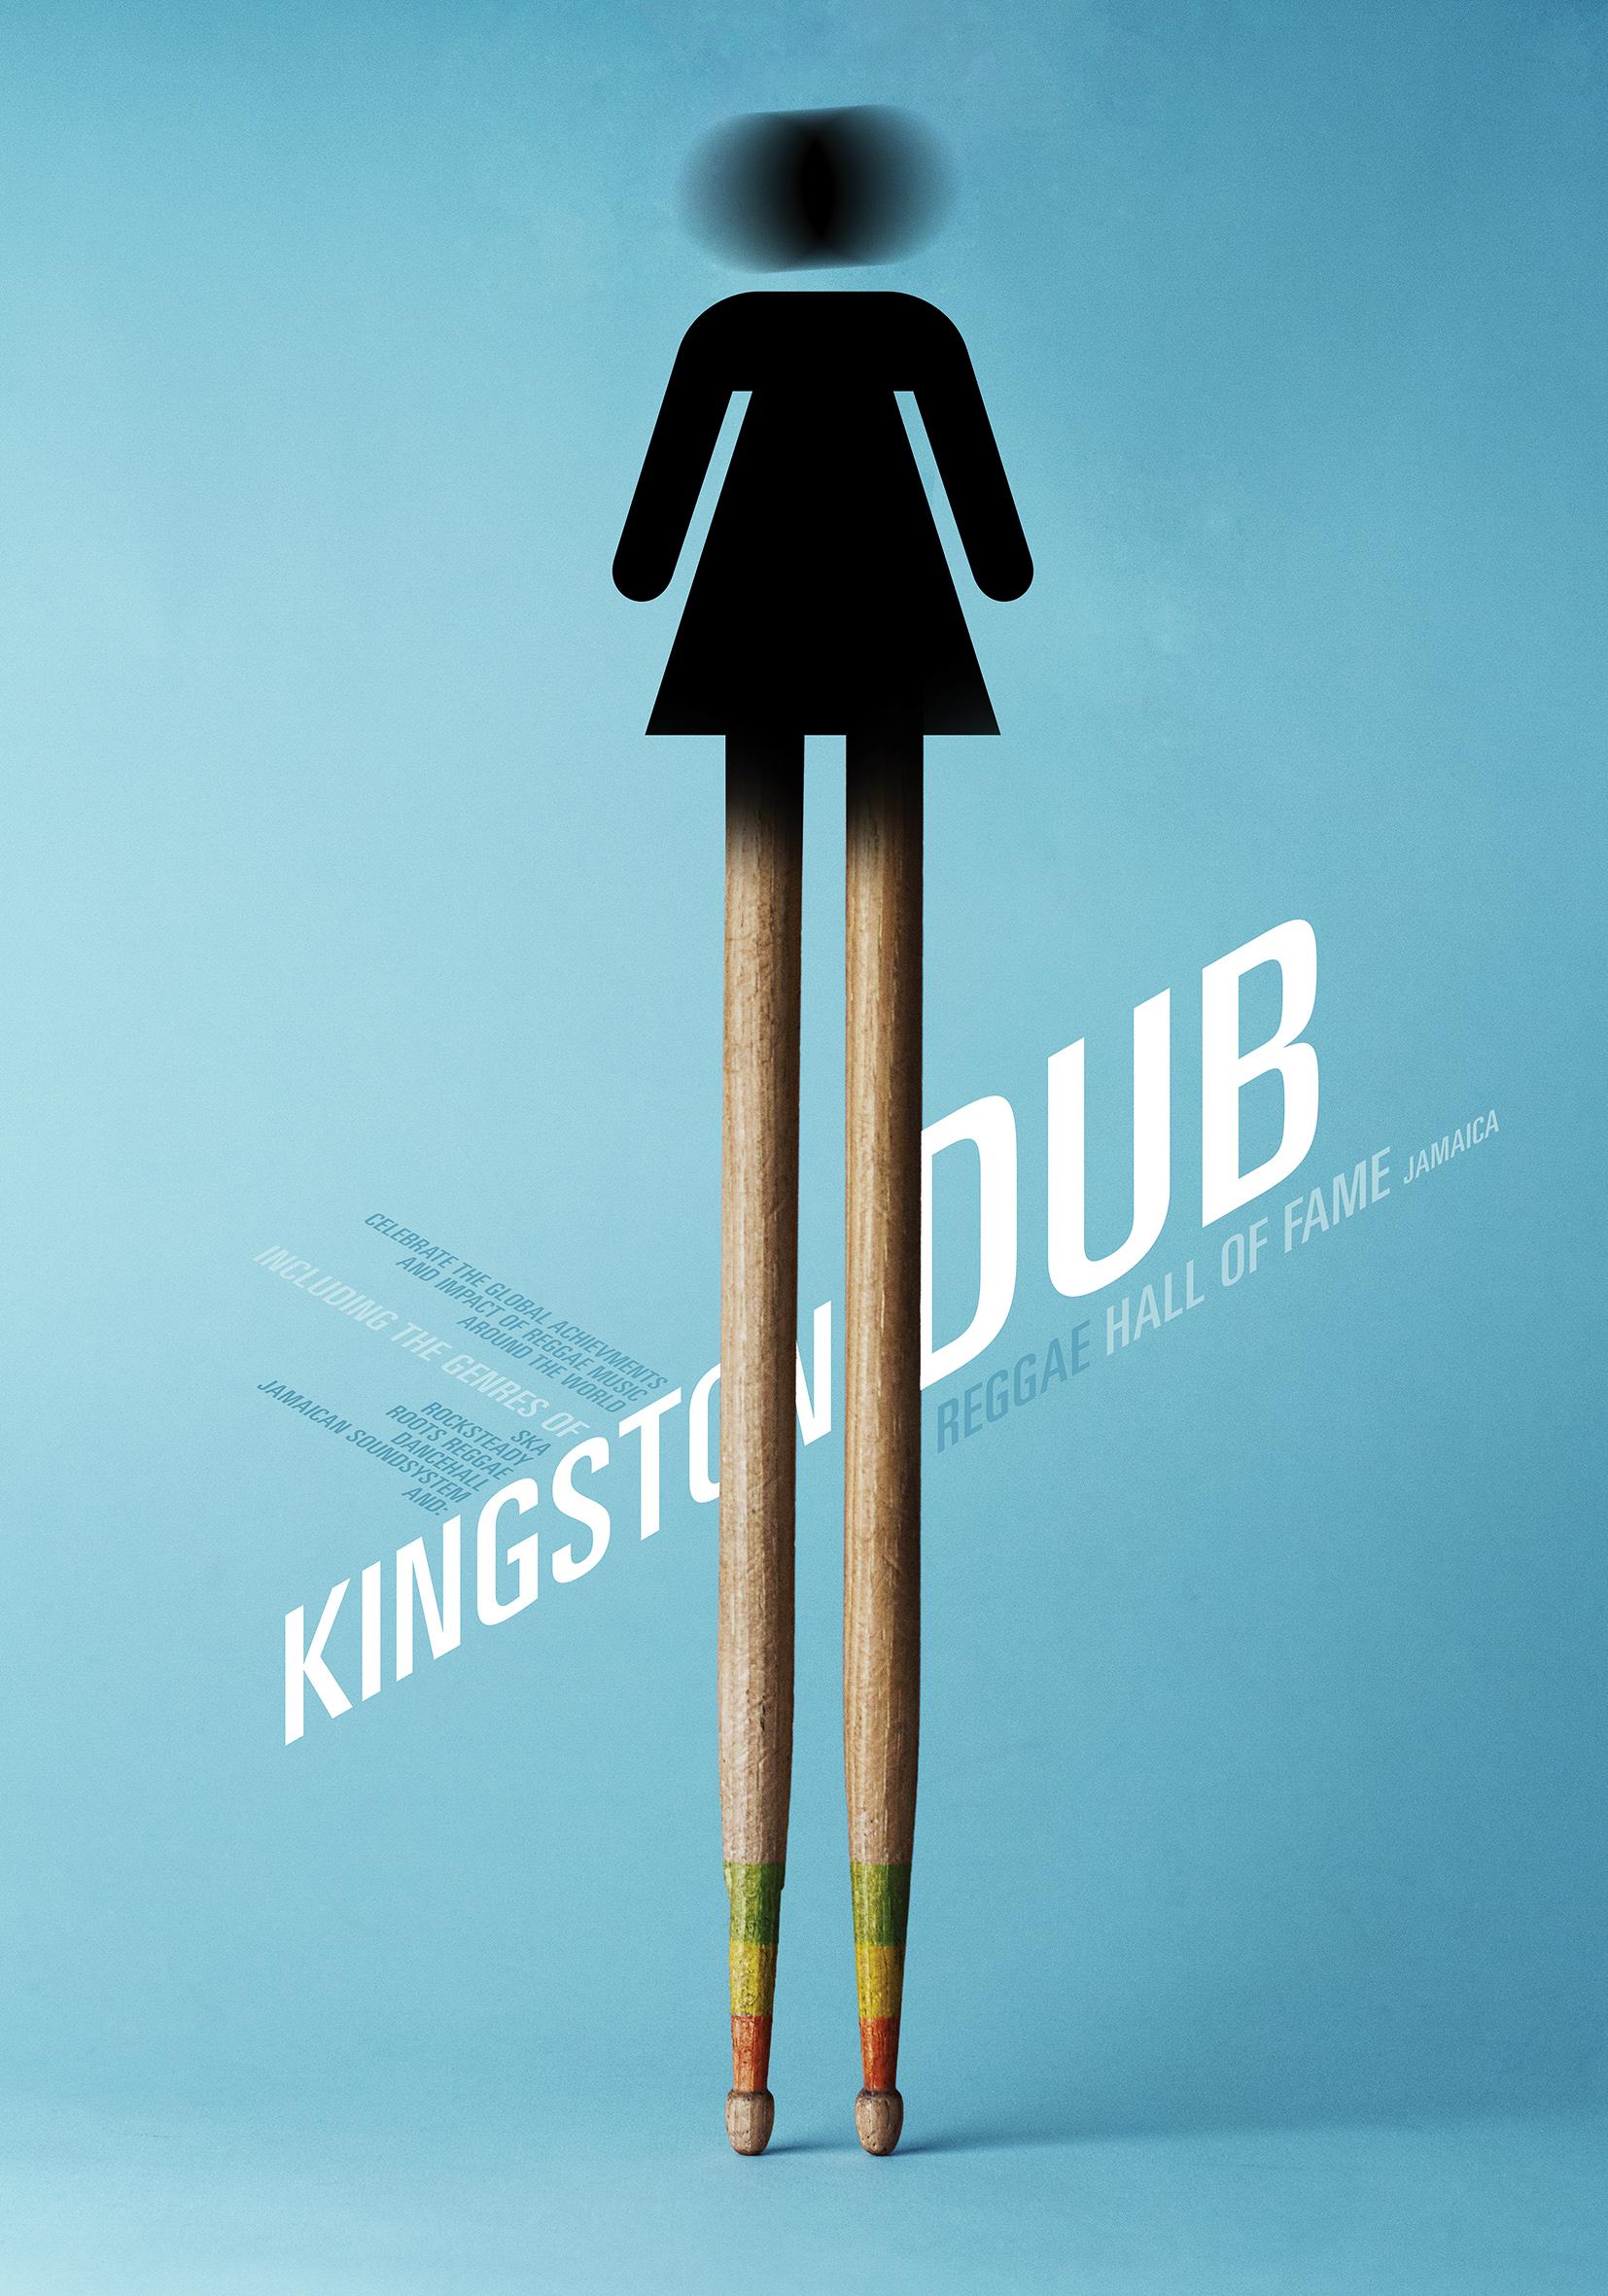 Warner-Daniel-Poster03-KingstonDub.jpg